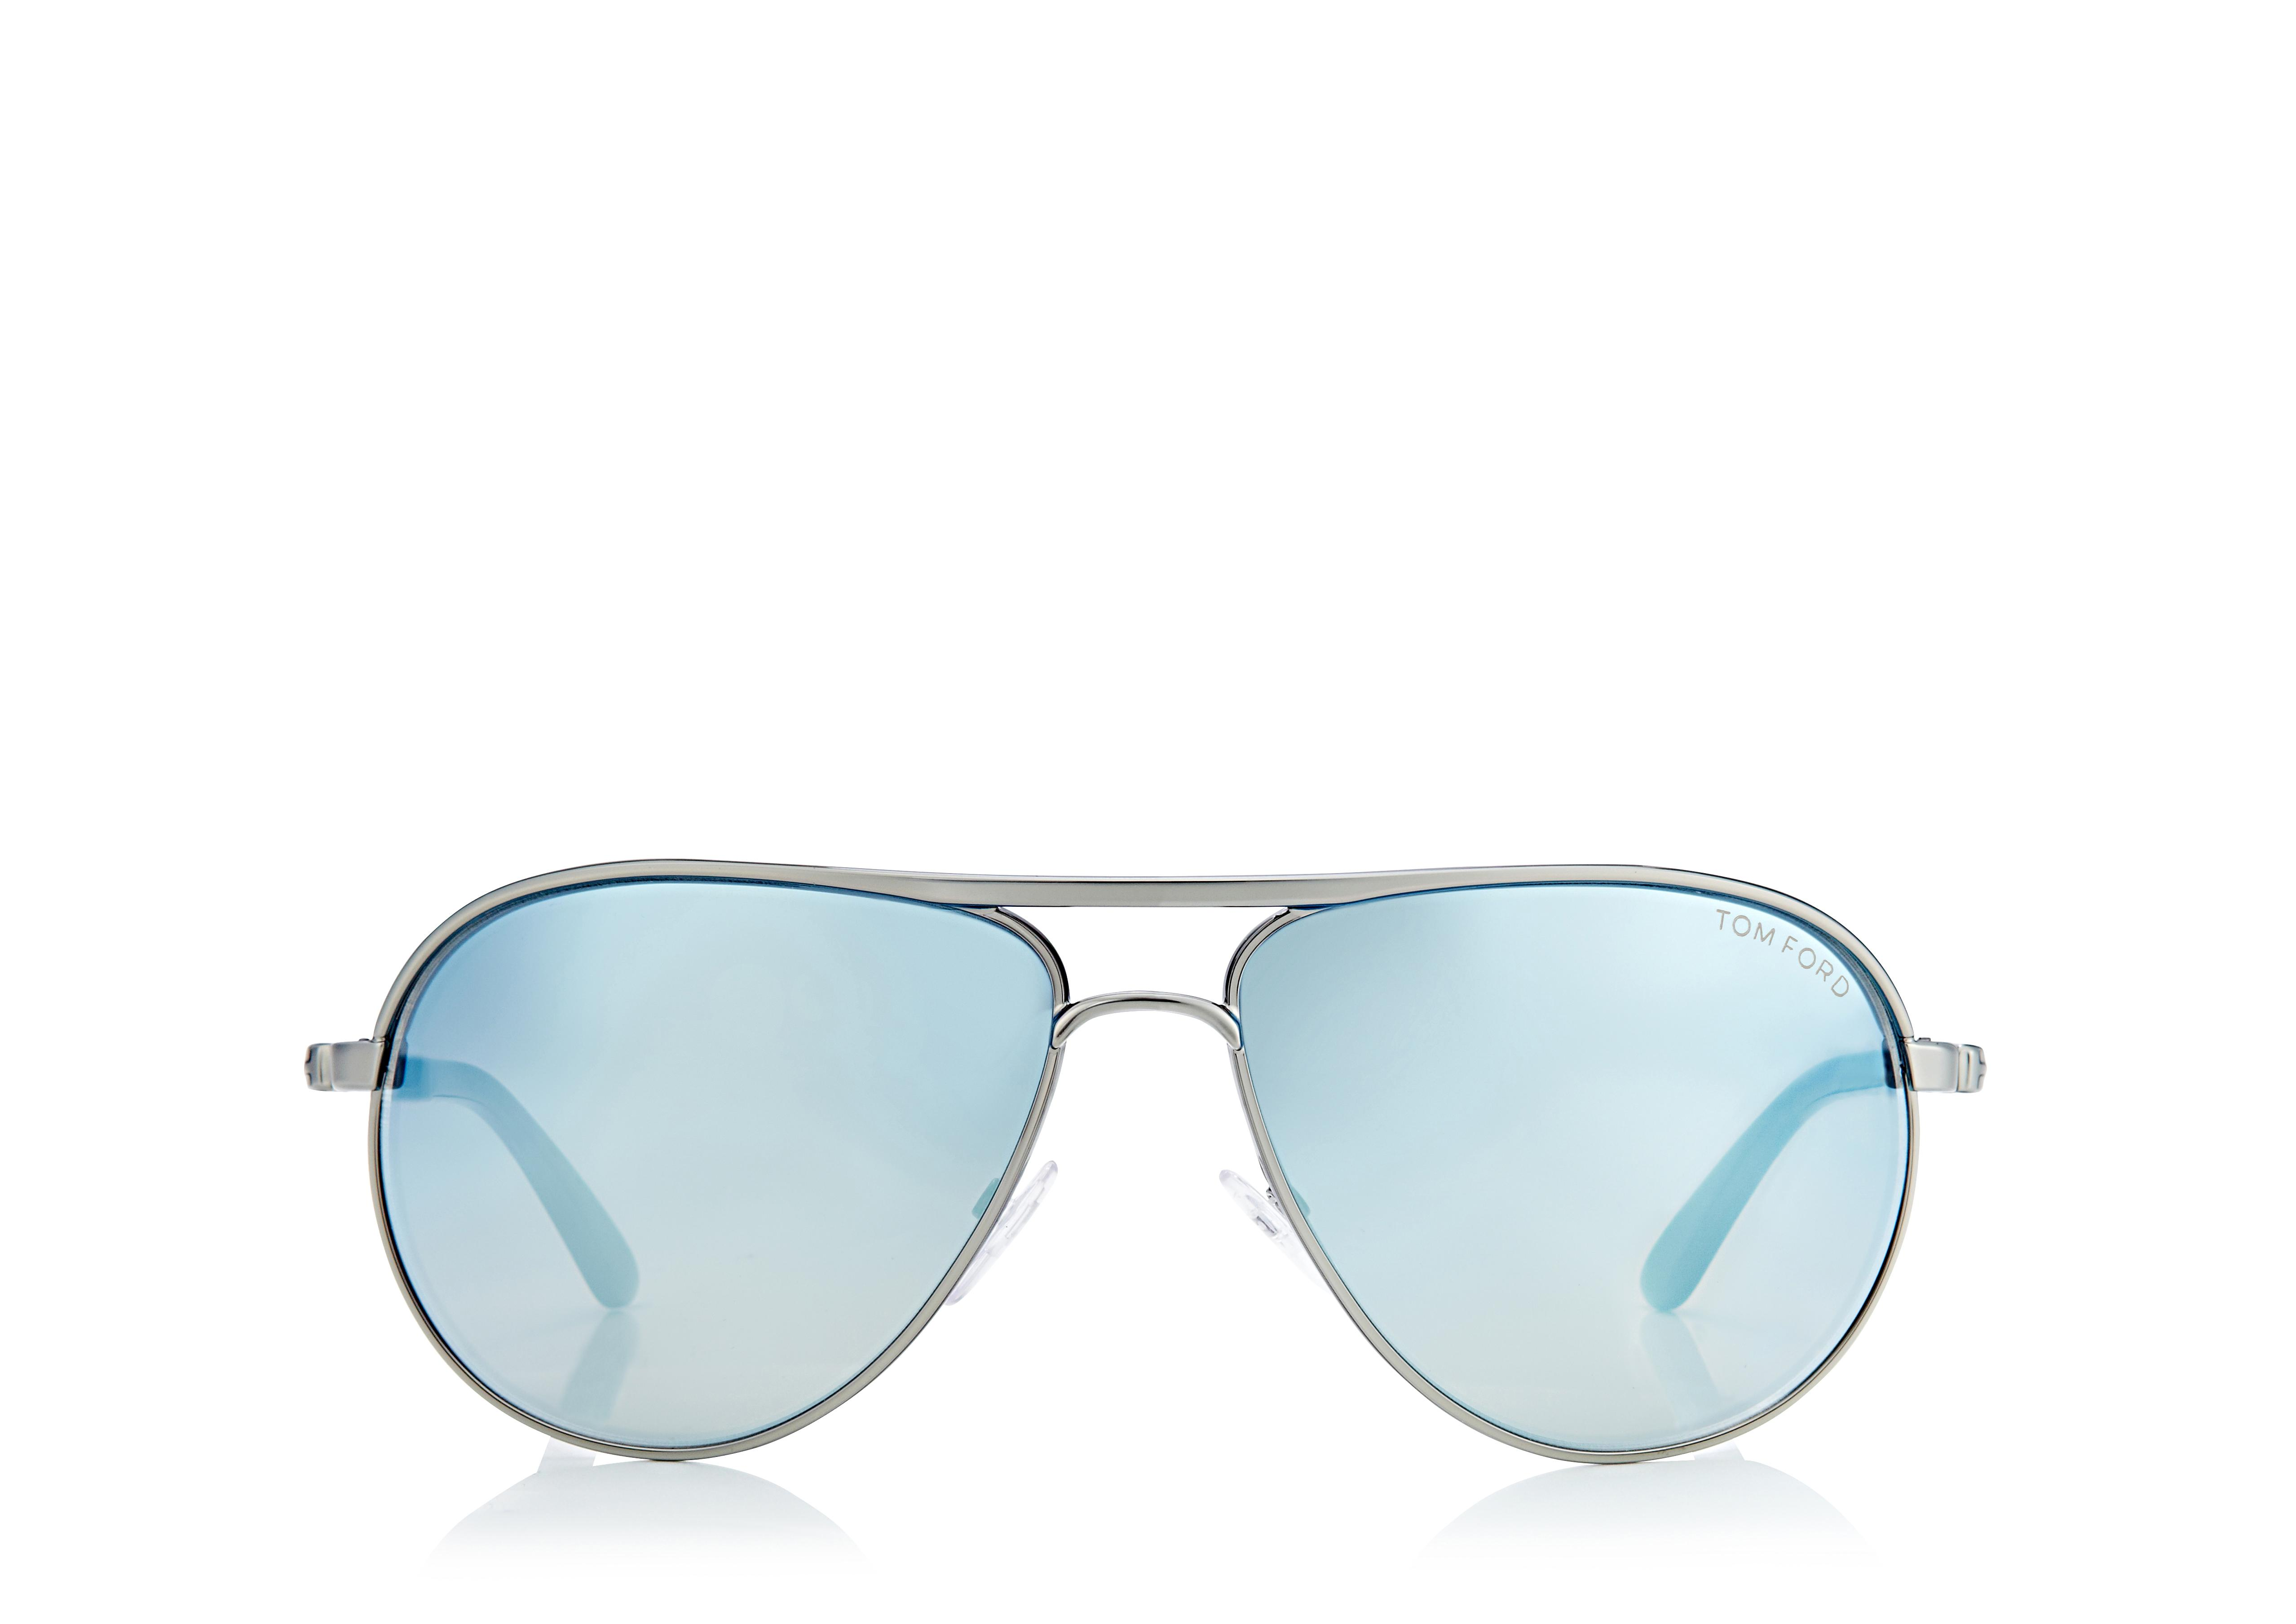 Marko Aviator Sunglasses A thumbnail